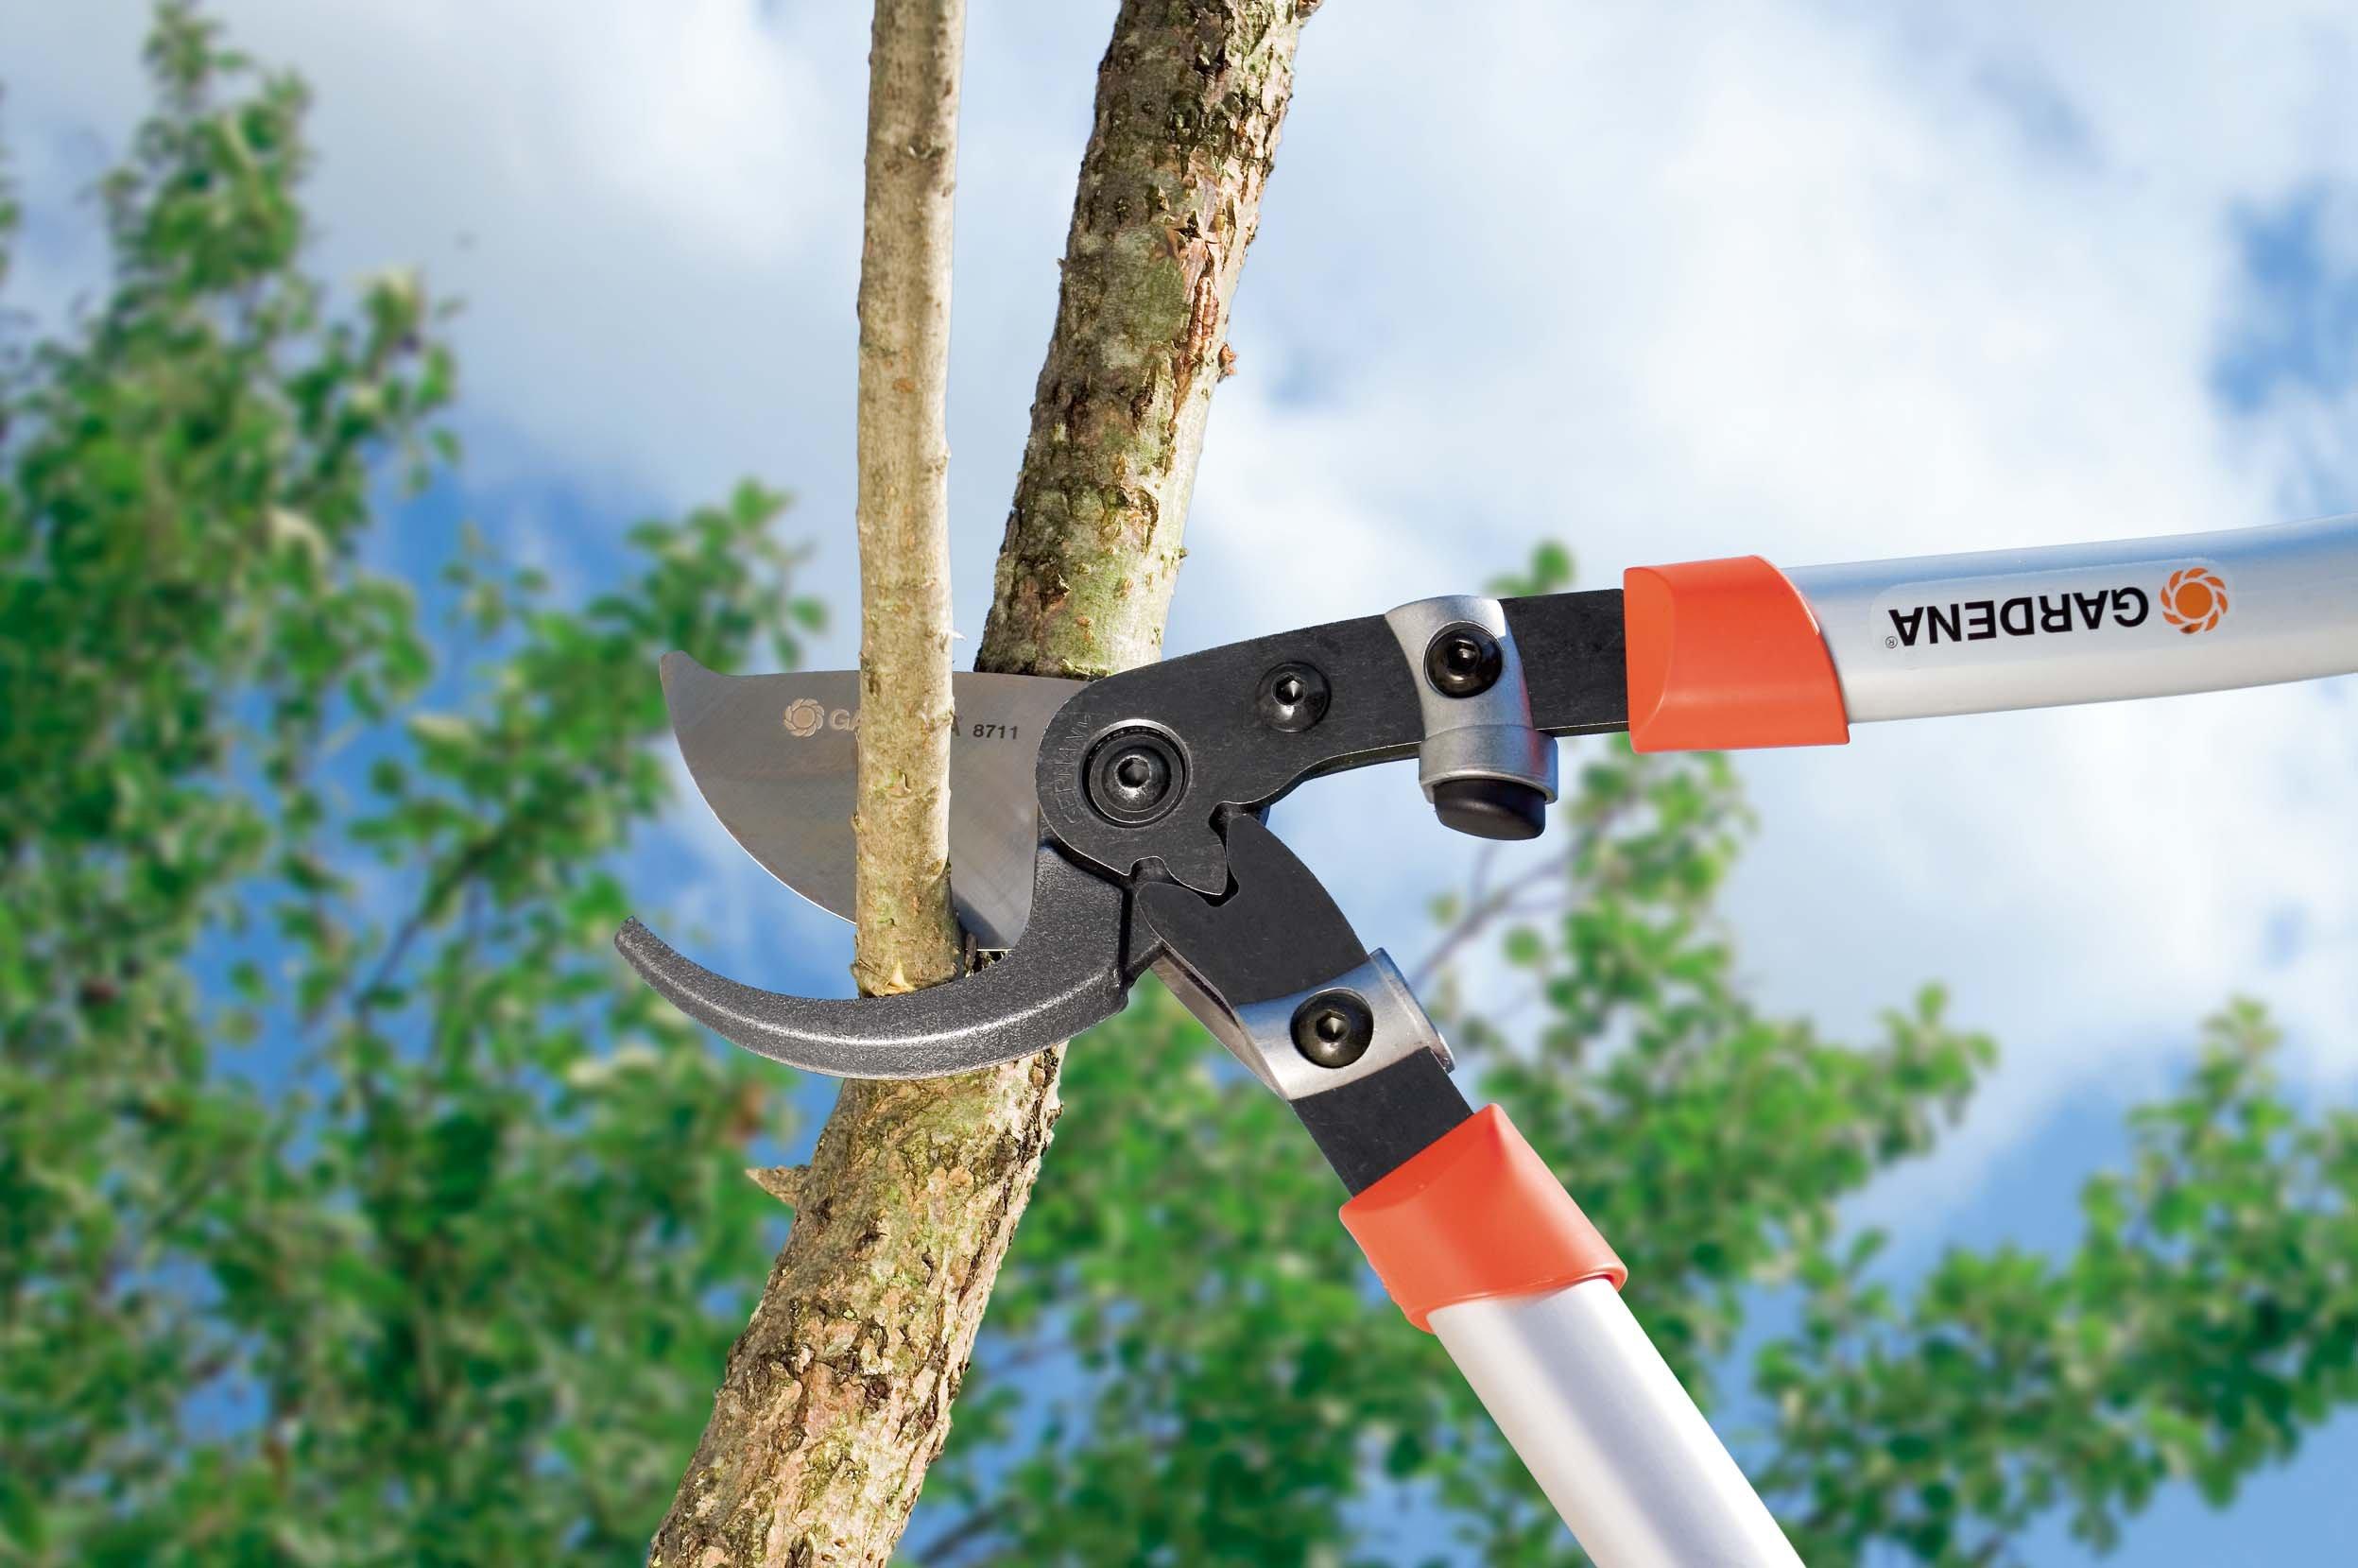 Gardena 8711 30-Inch Bypass Pruning Lopper With 1-1/2-Inch Cut & Ergonomic Aluminum Handles